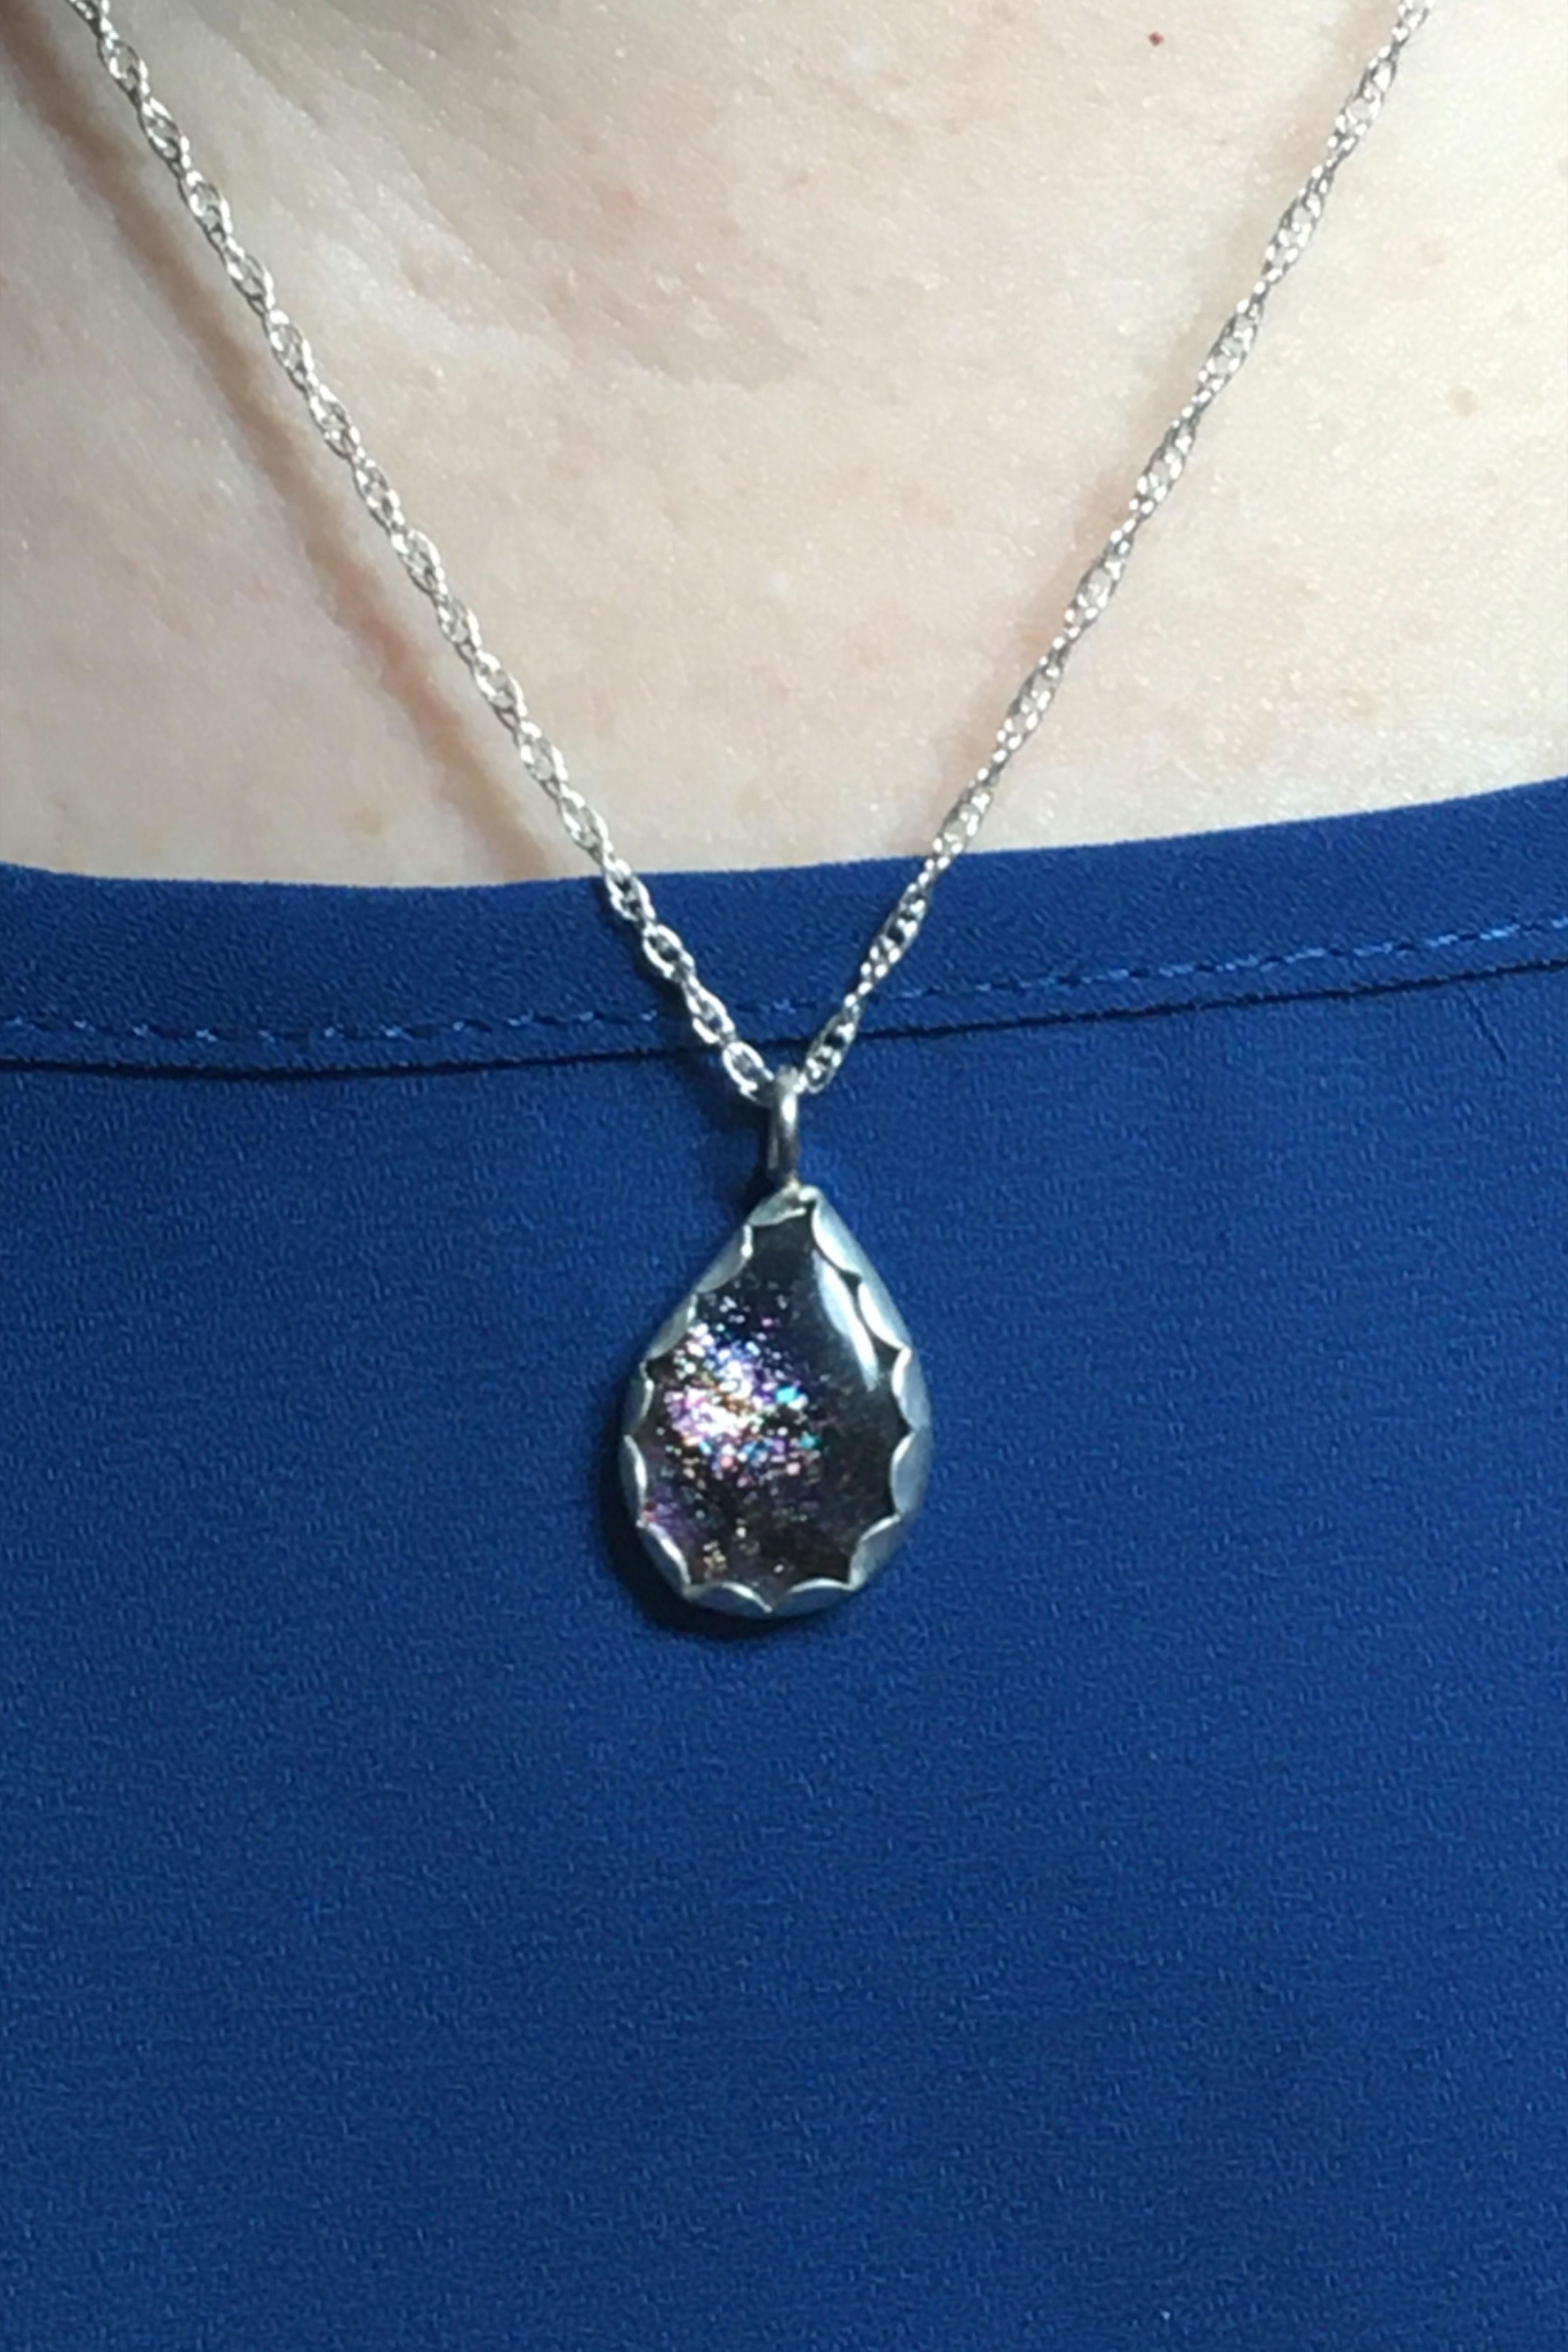 Sterling Silver Handmade Jewelry Pendant Women Jewelry Iolite jewelry Women Pendant Iolite Pendant Gift Her